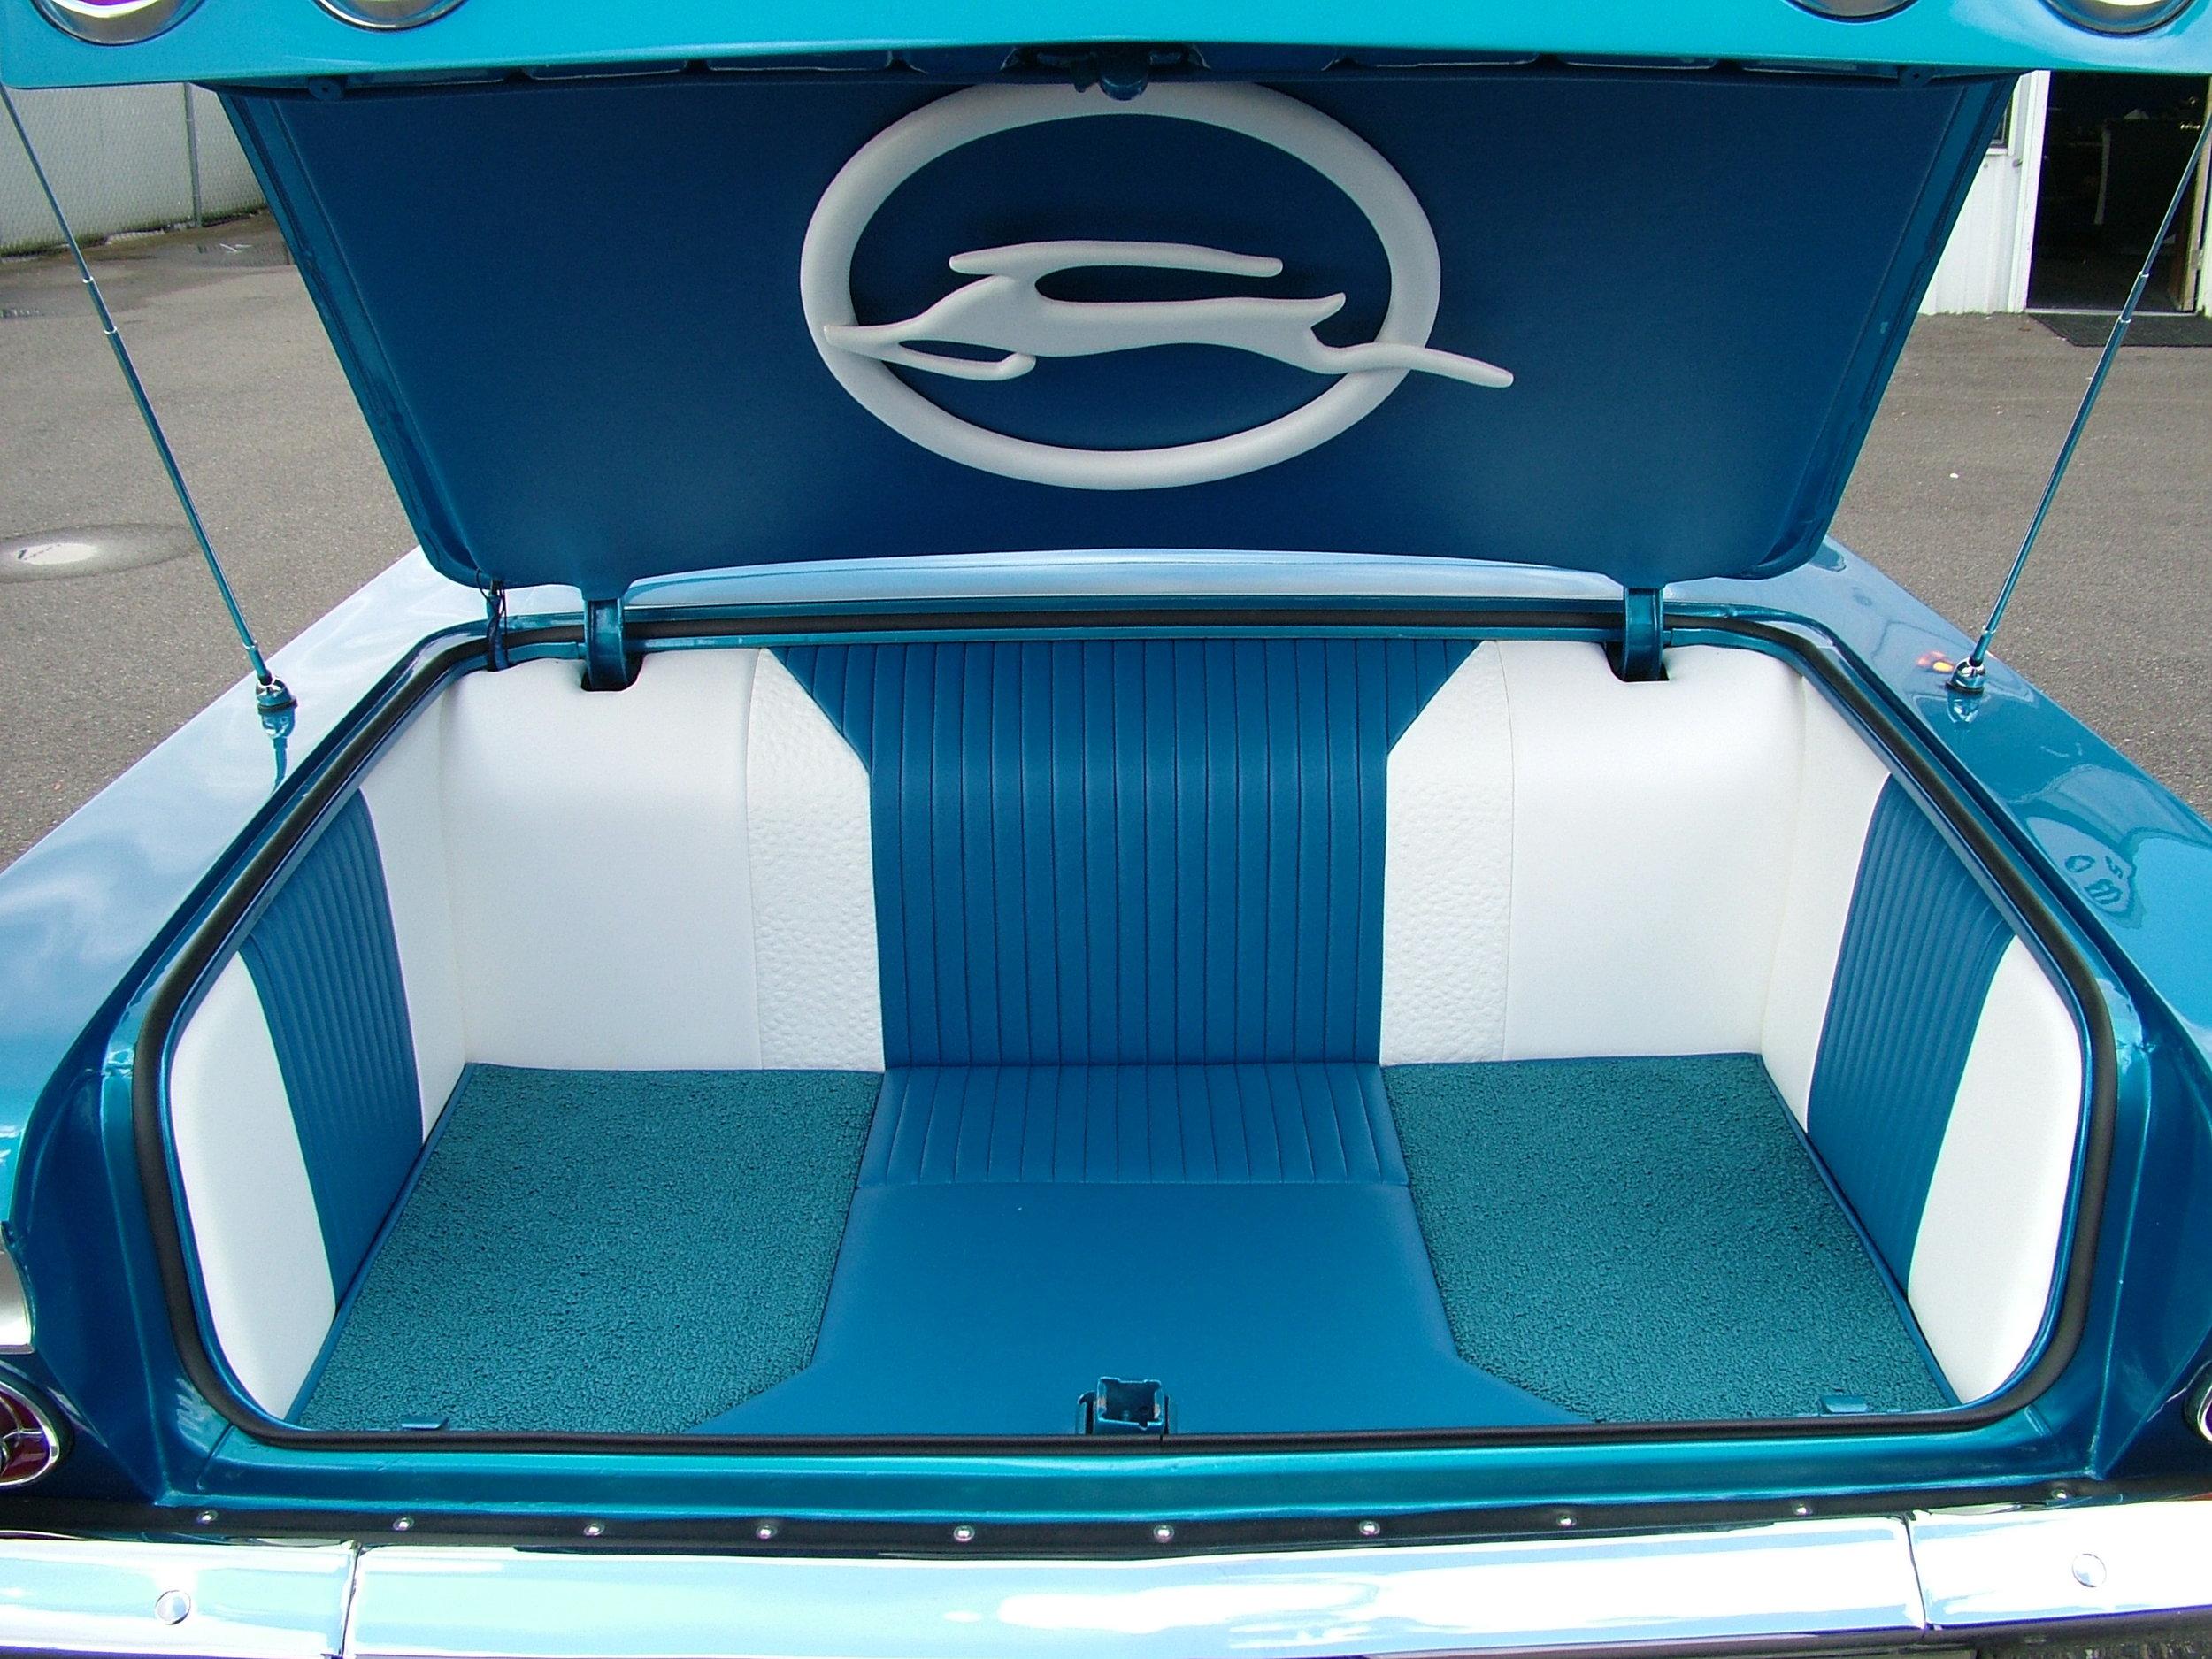 Impala - Custom Trunk, Blue and white stitched leather and custom carpet.